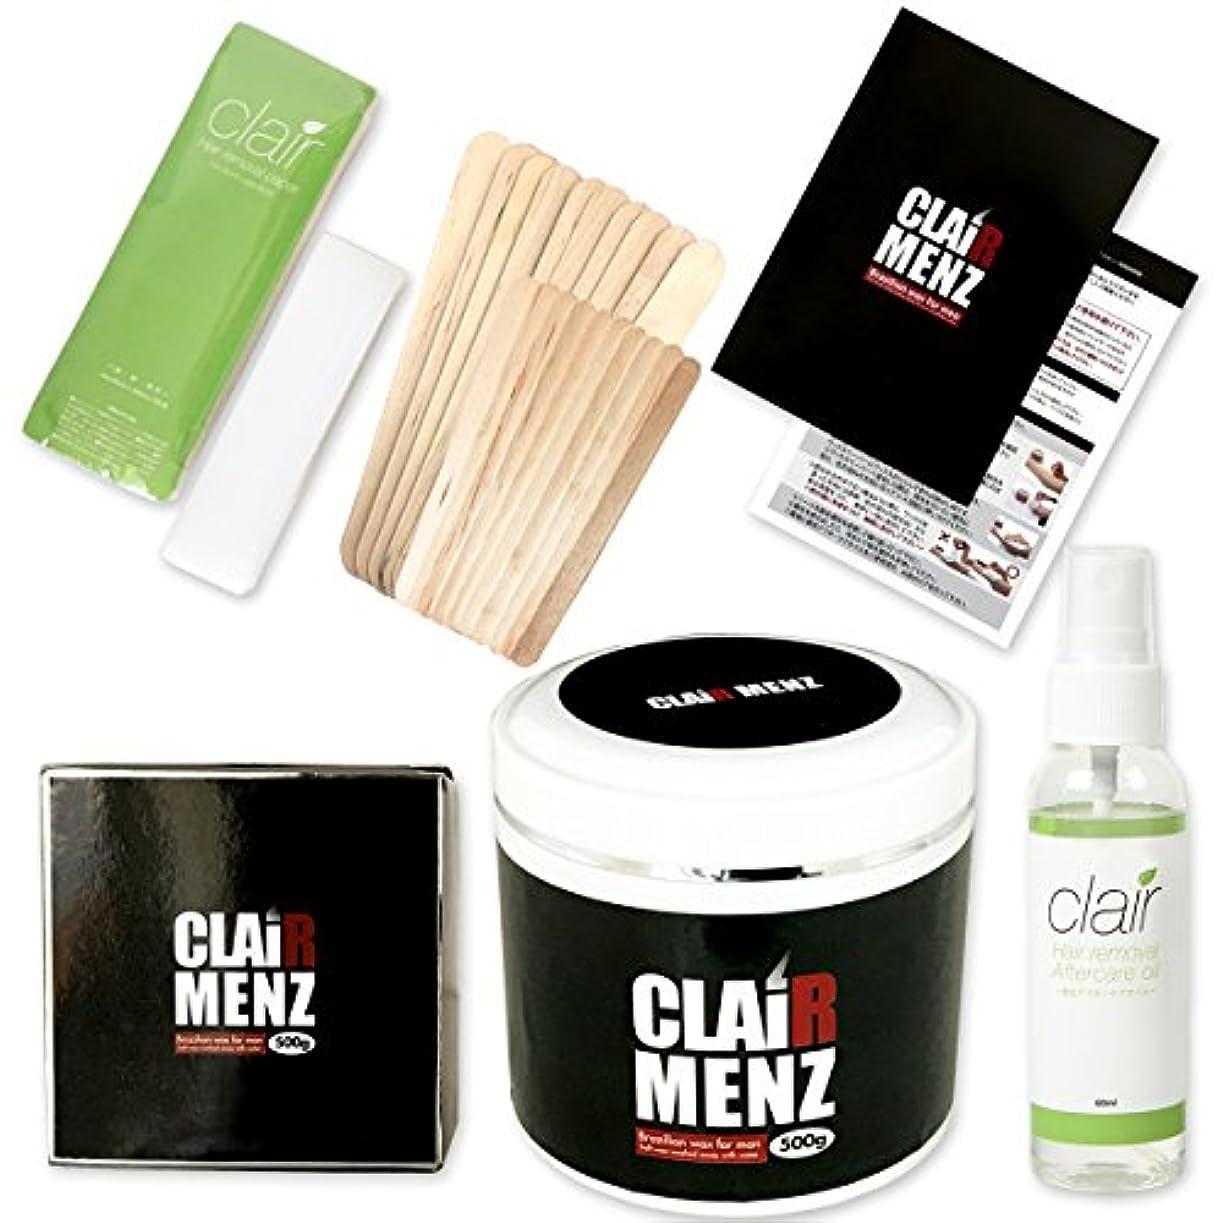 clair Menz wax ブラジリアンワックス スターターキット 【取扱説明書付】